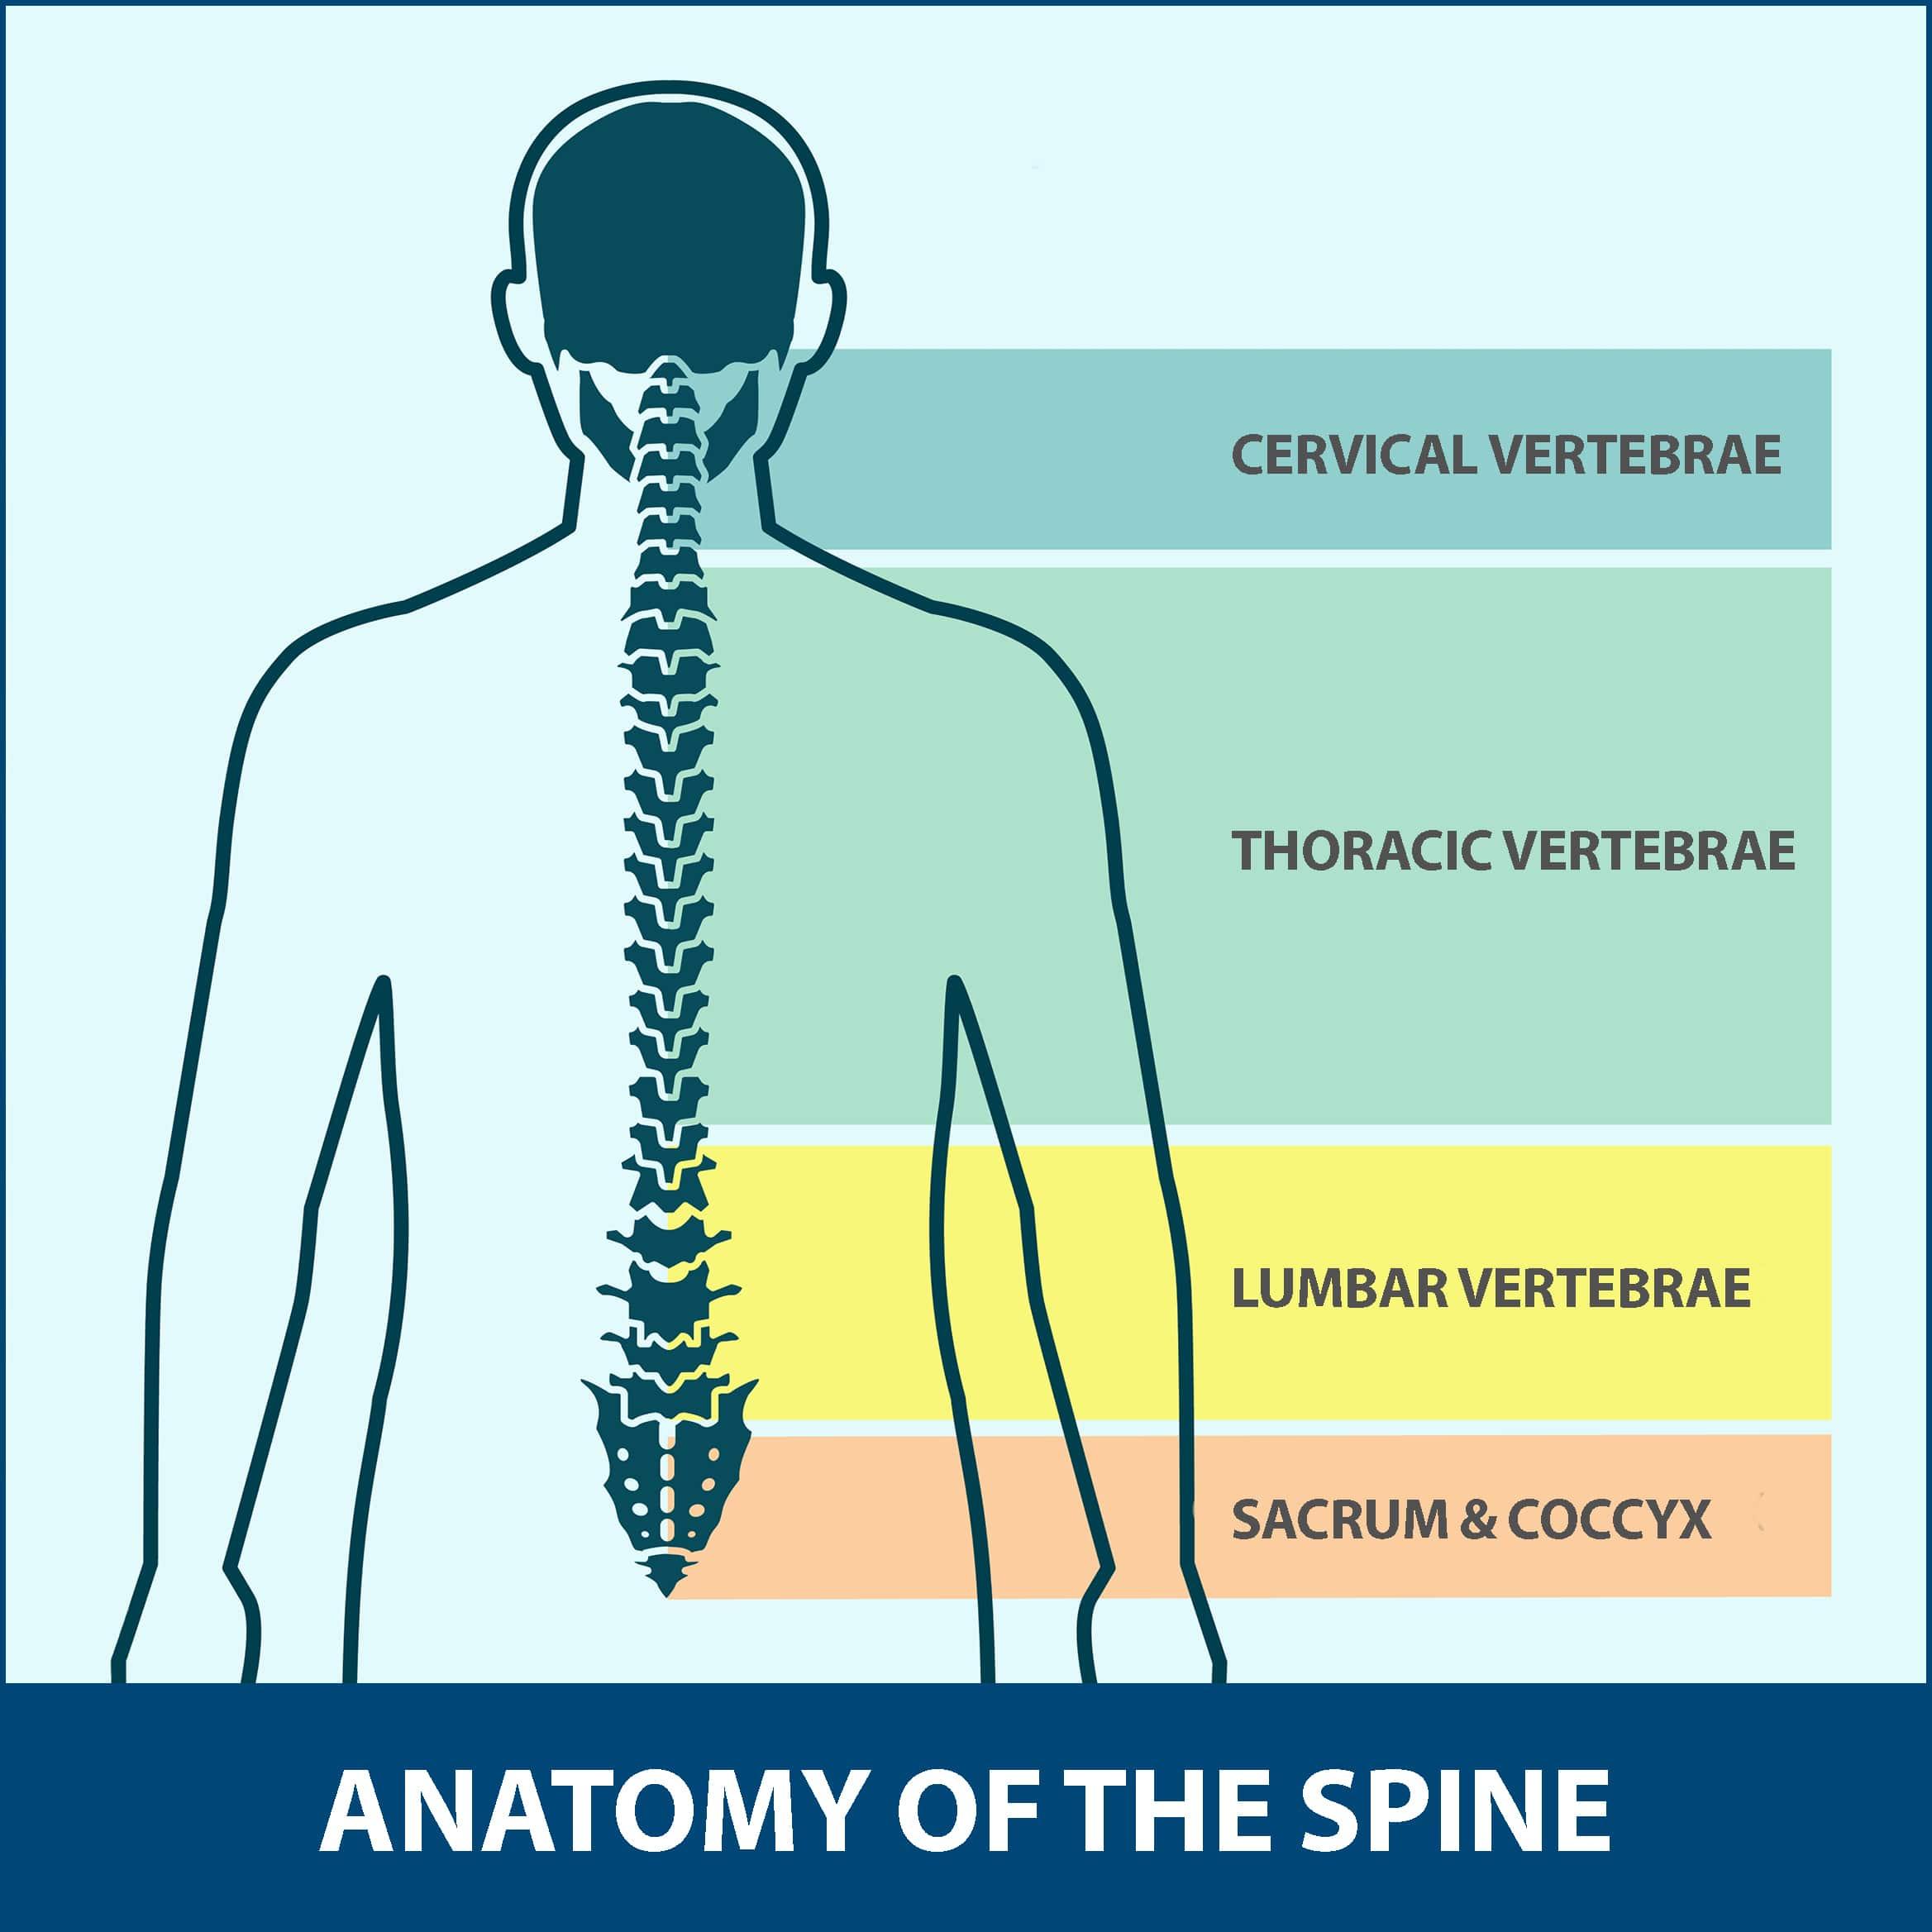 Diffuse Idiopathic Skeletal Hyperostosis Anatomy of Spine